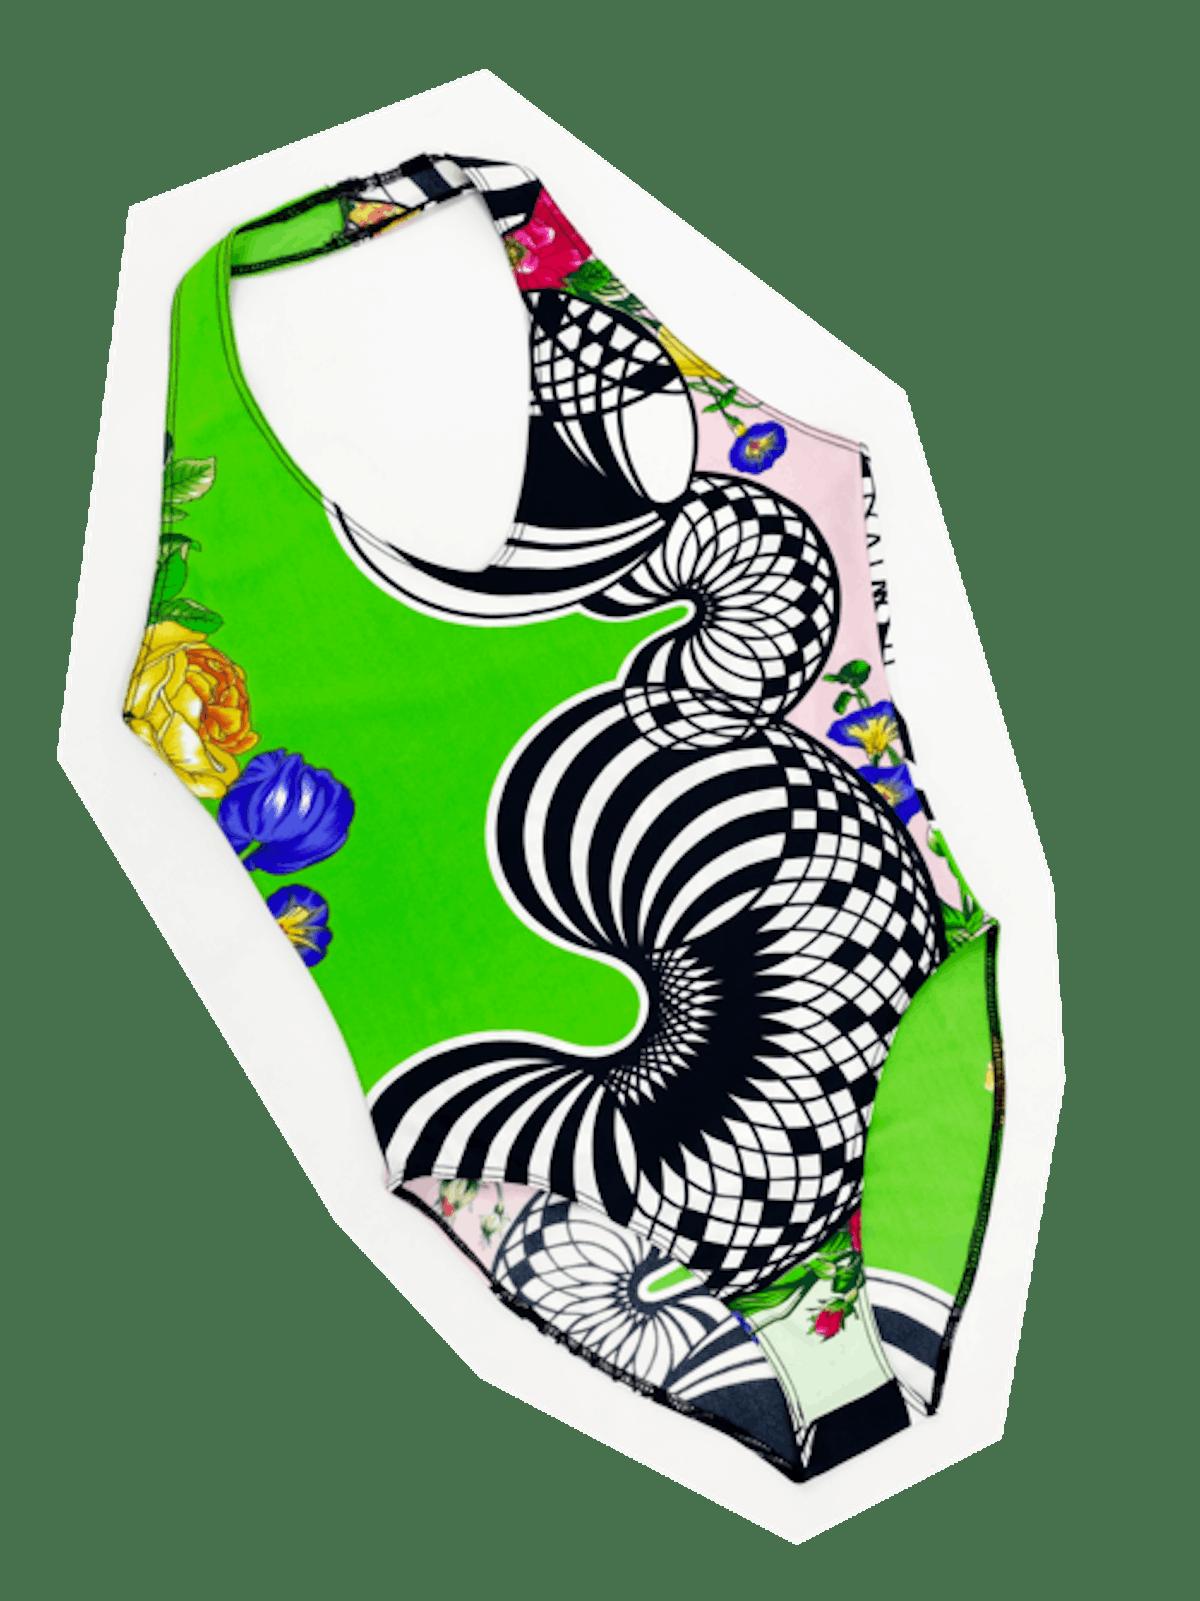 Gianni Versace Swimsuit